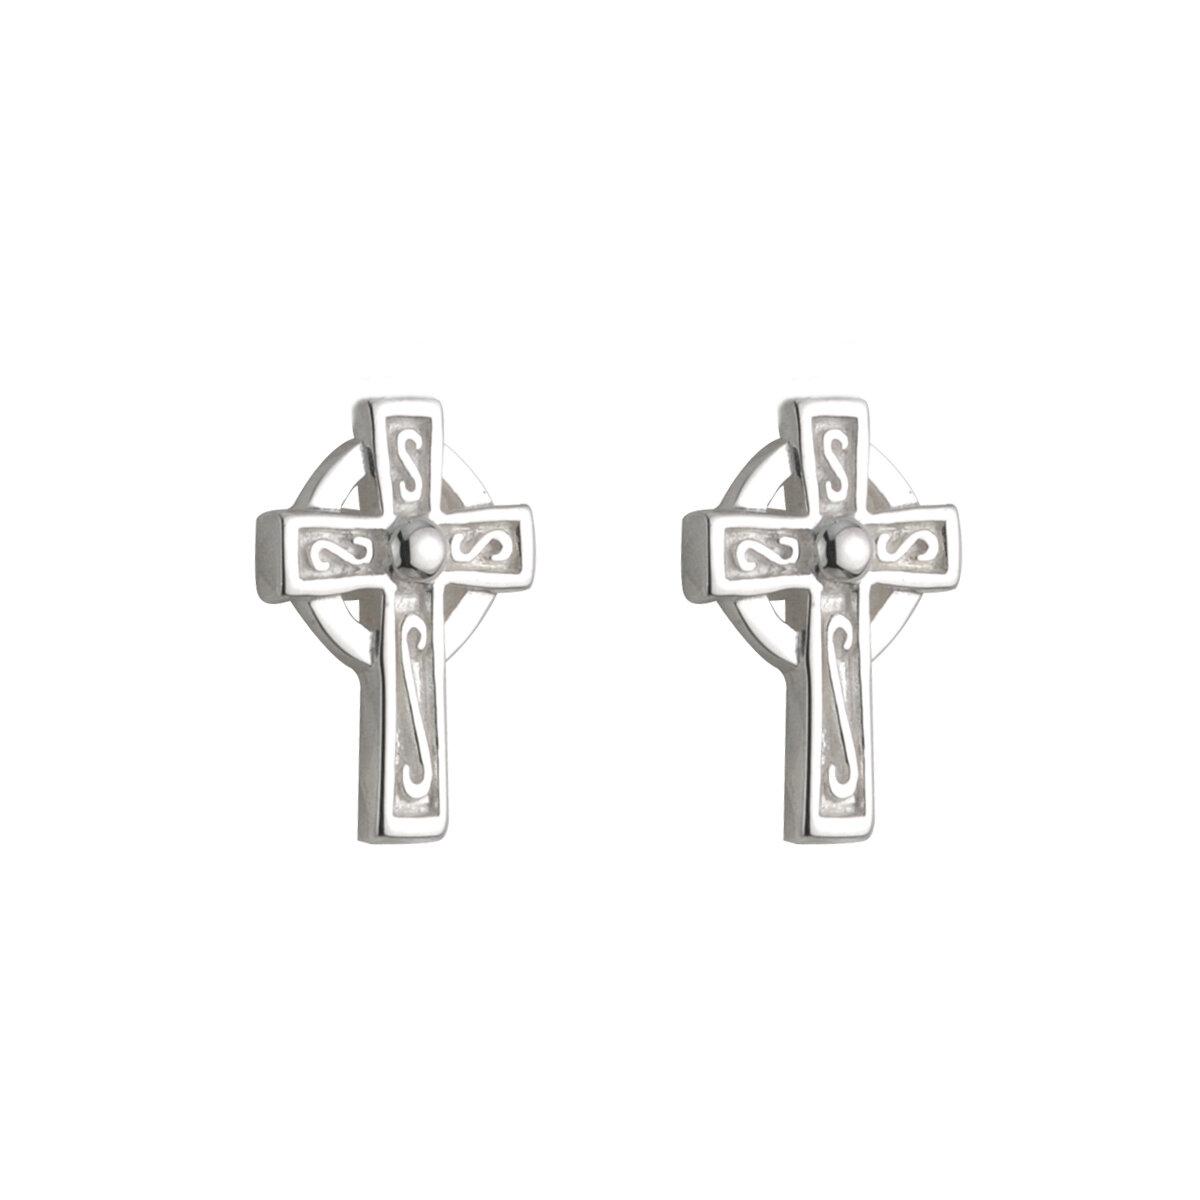 sterling silver small cross stud earrings s33274 from Solvar